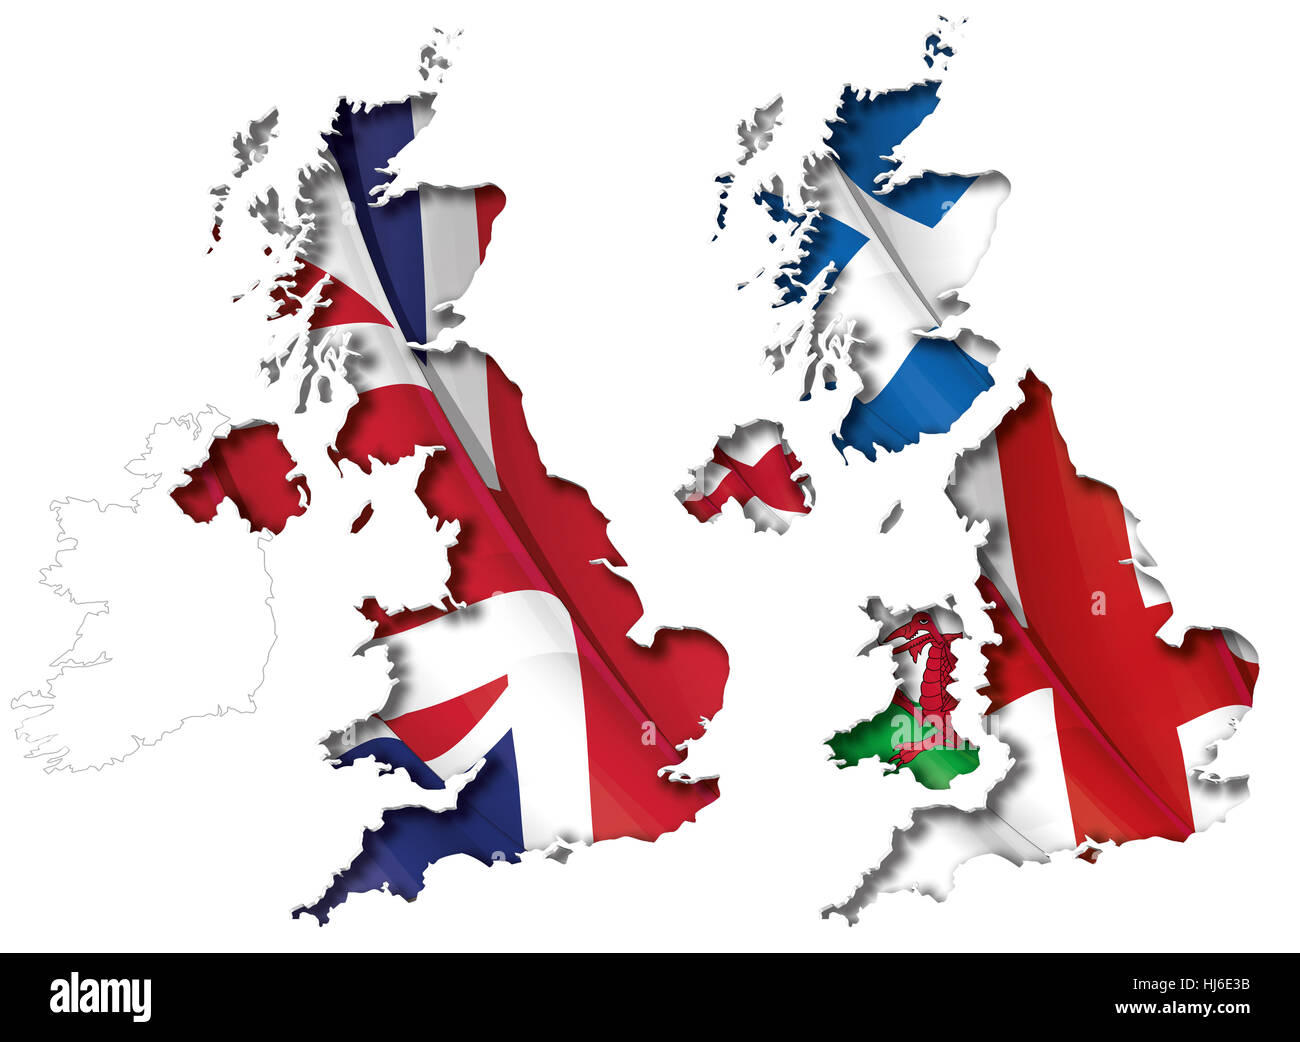 Map Of Scotland Wales And England.England Ireland Scotland Wales Map Stock Photos England Ireland